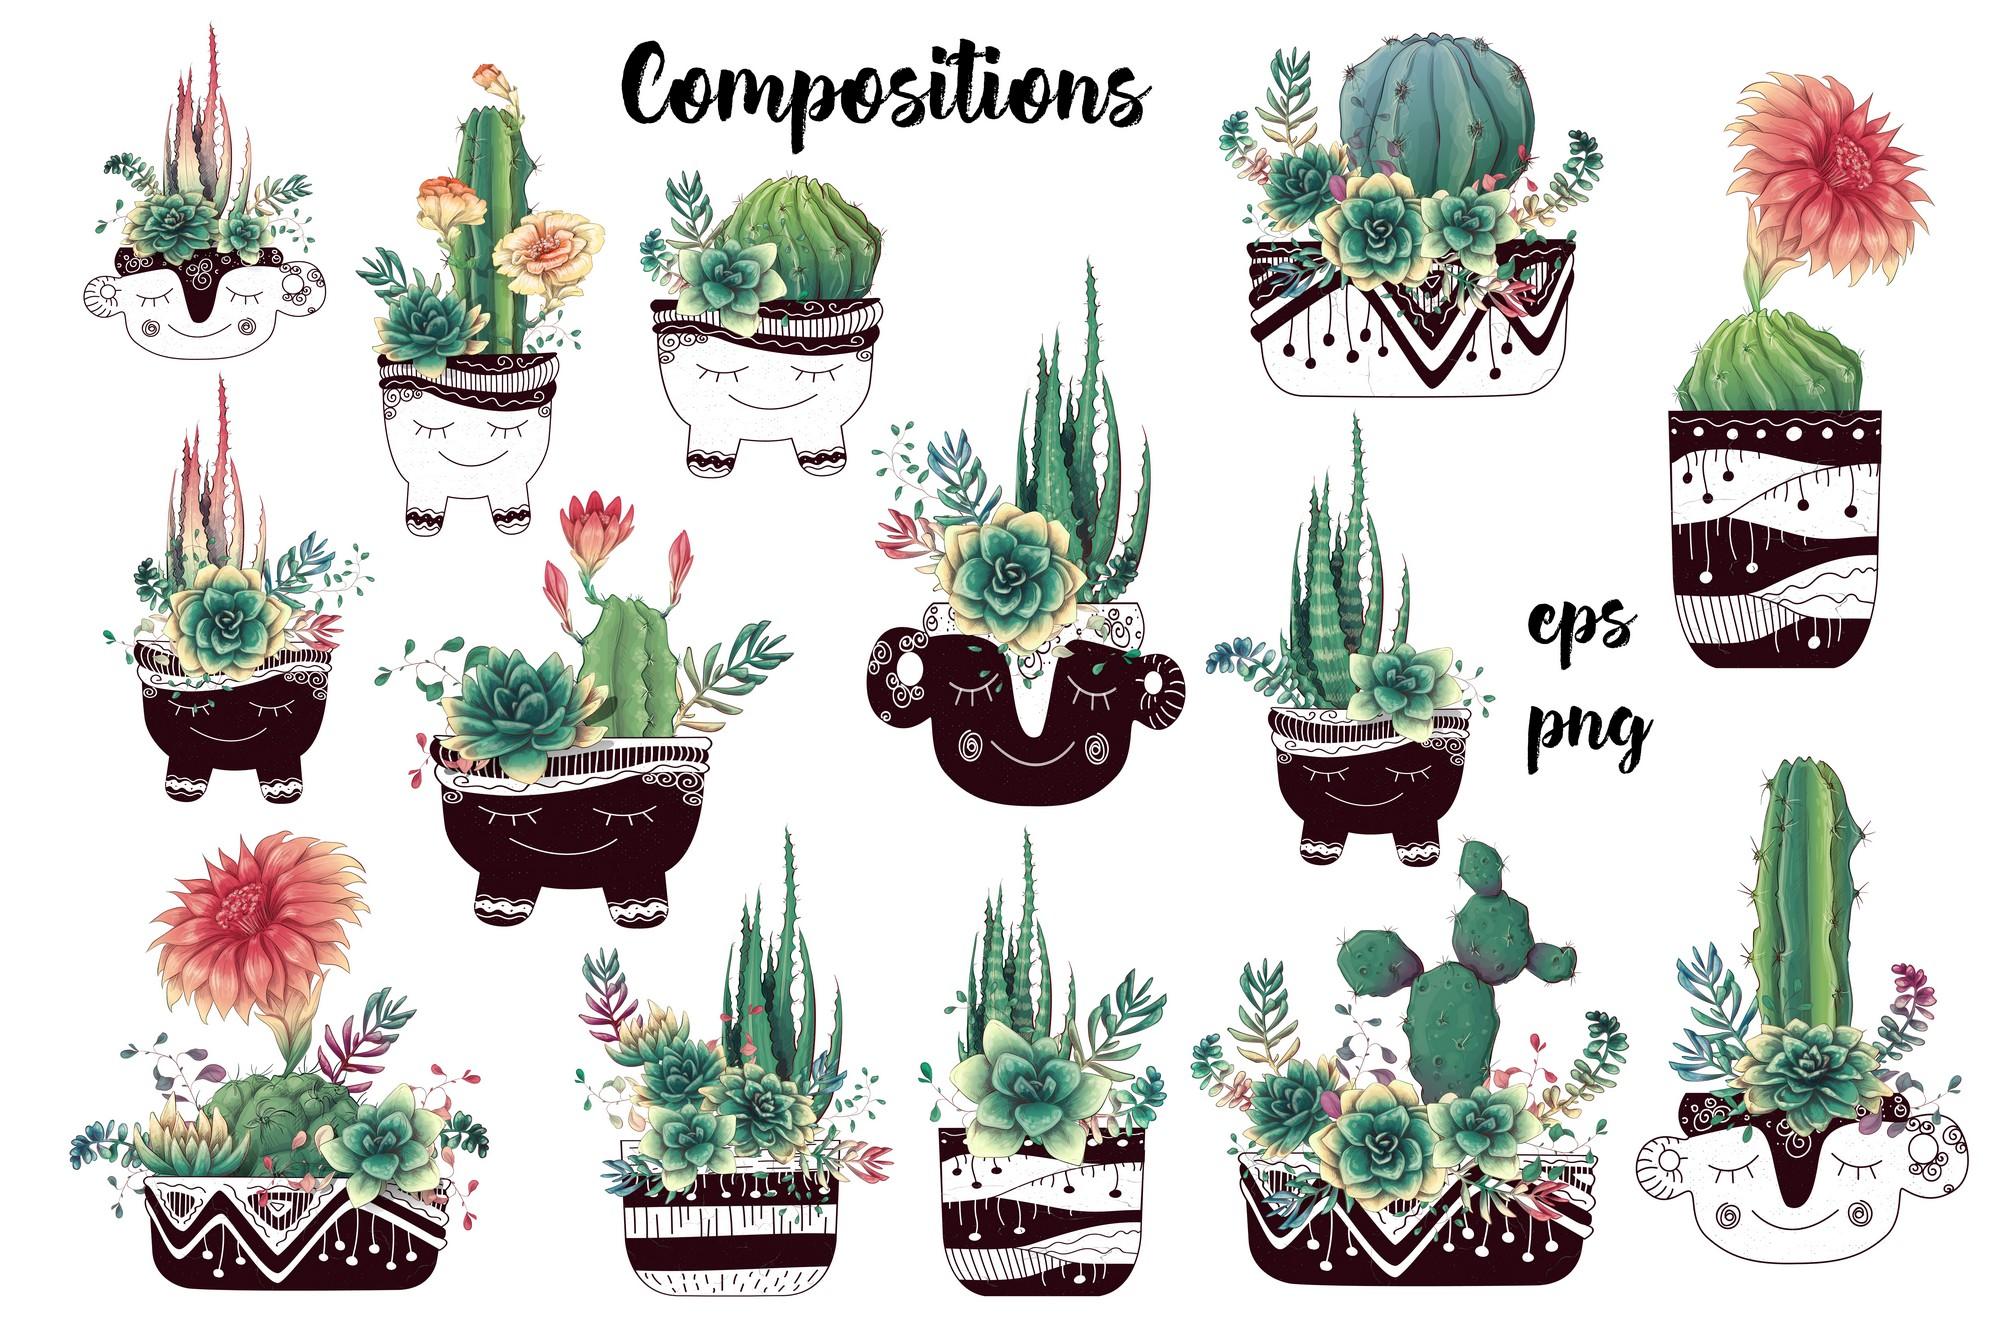 Cute Cactus Clipart: Cacti & Succulents Vectors - Image00004 1